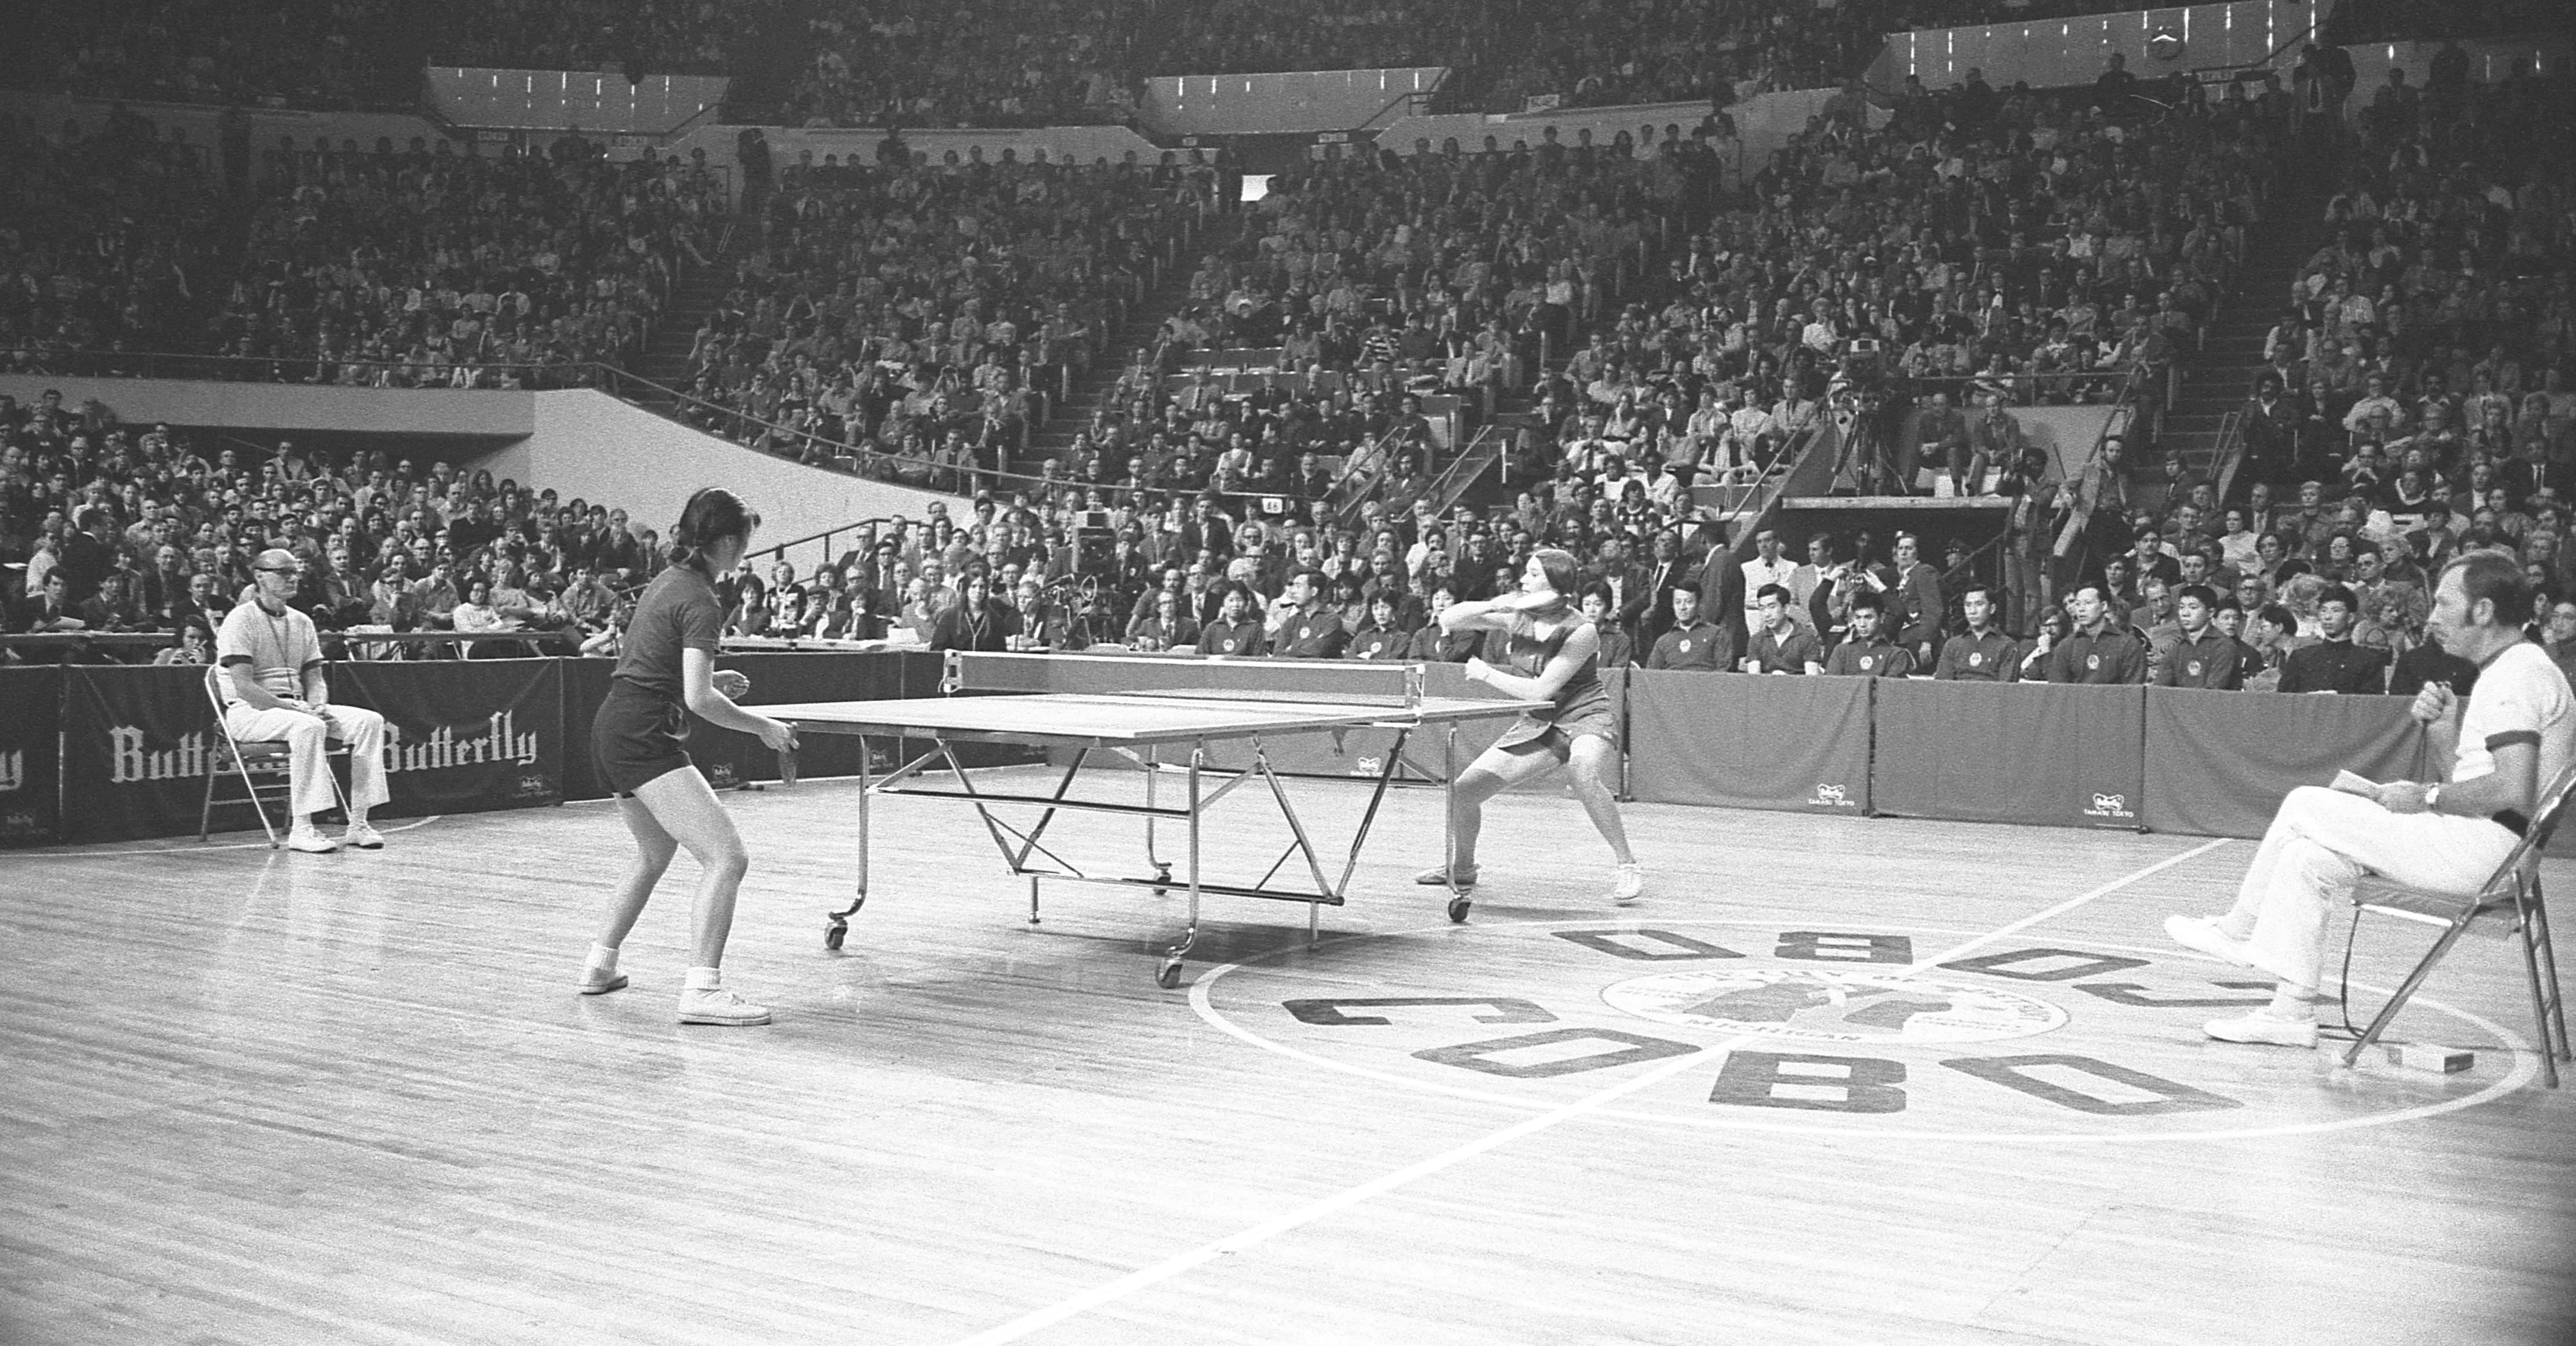 Ping-Pong Diplomacy Match